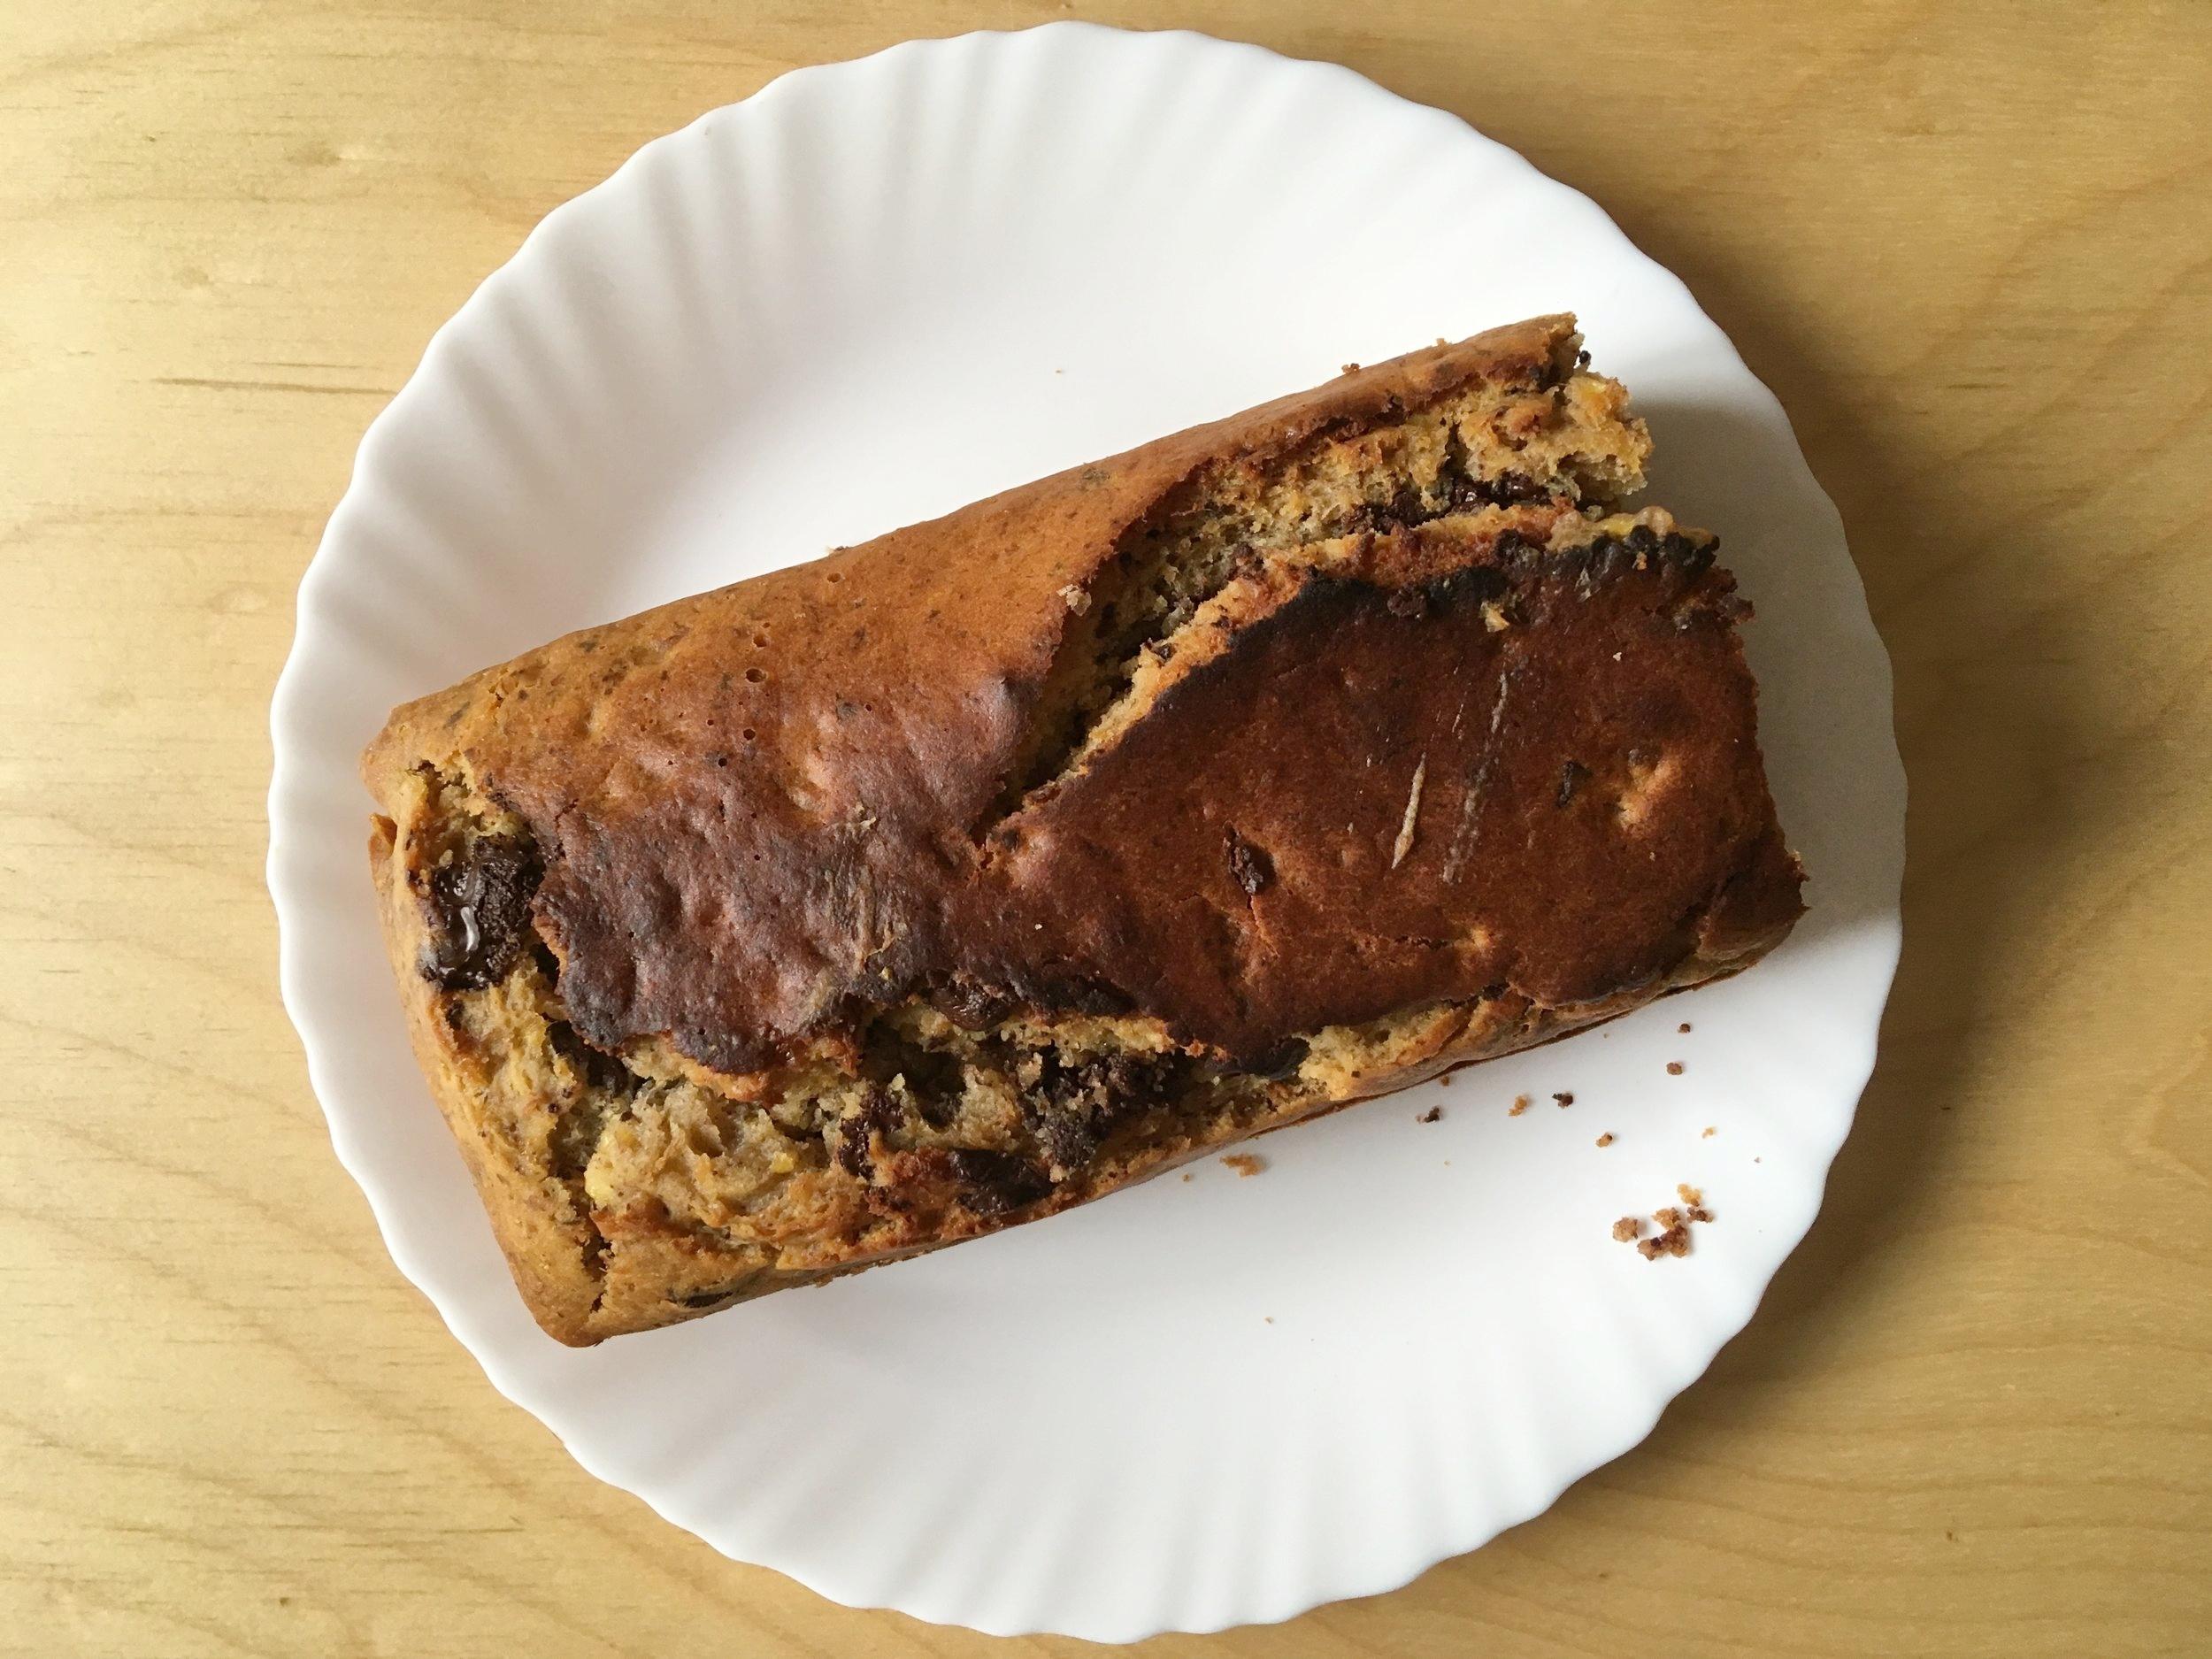 Chocolate Chip Banana Bread: delicious even when you burn it!